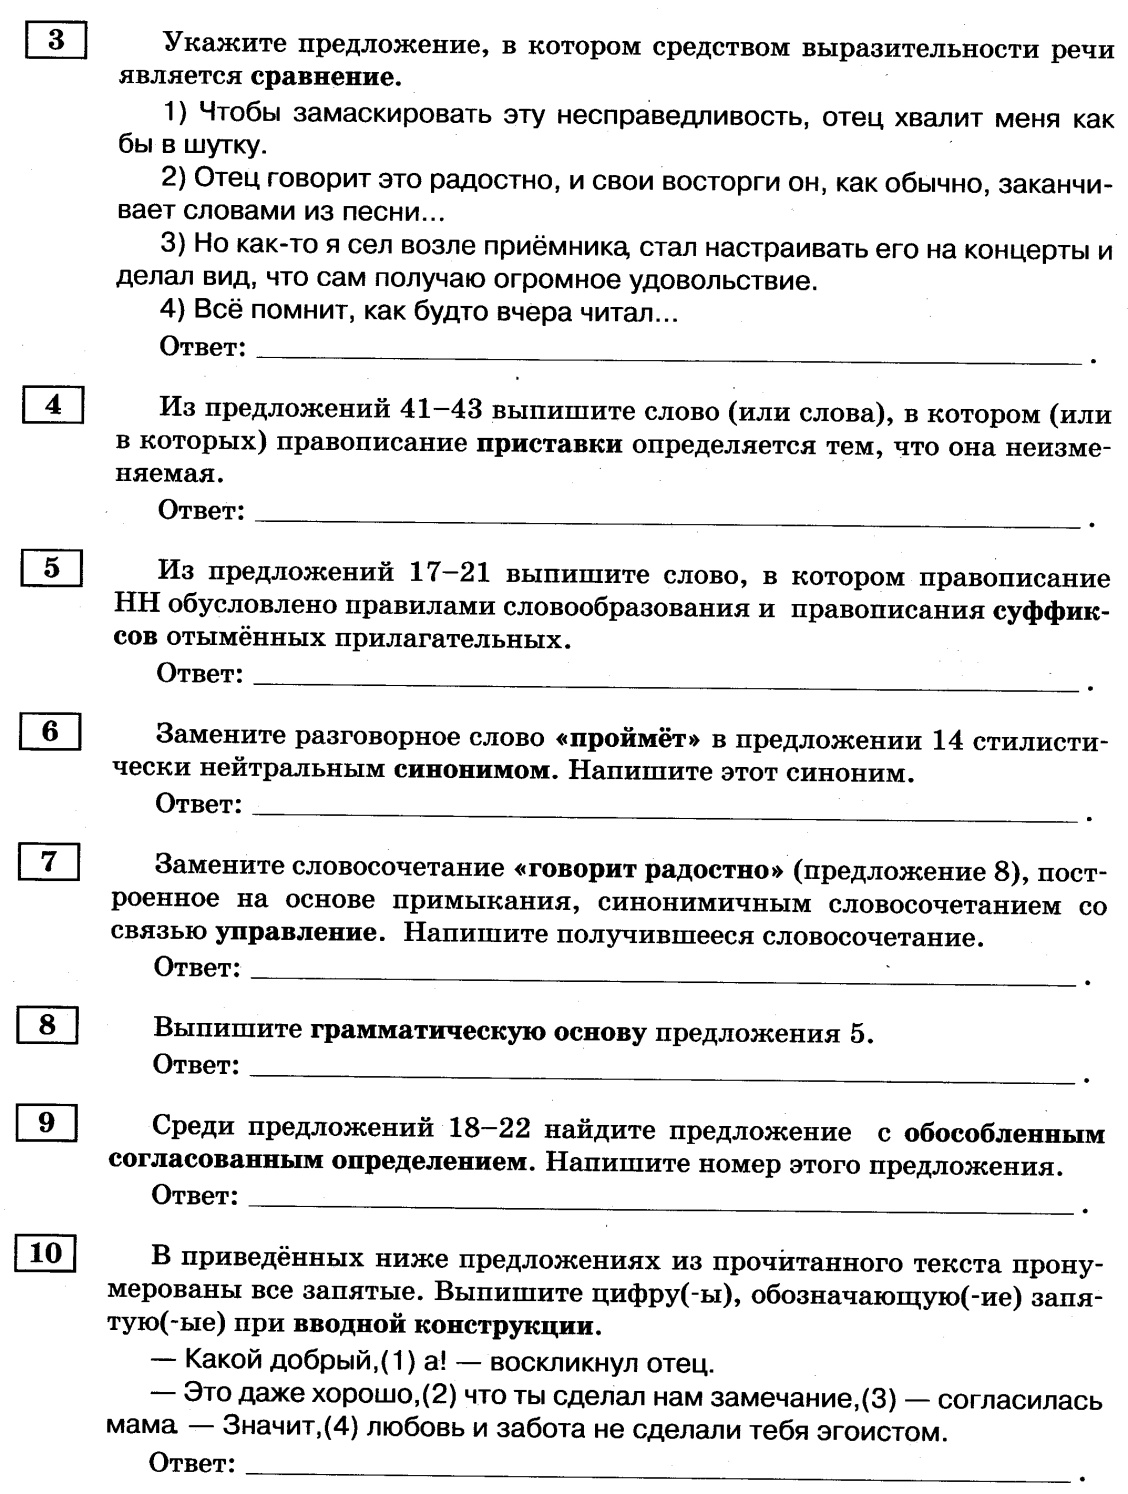 C:\Documents and Settings\Наташа\Рабочий стол\ОГЭ 2016\КИМы Степановой ОГЭ-2016\img291.jpg